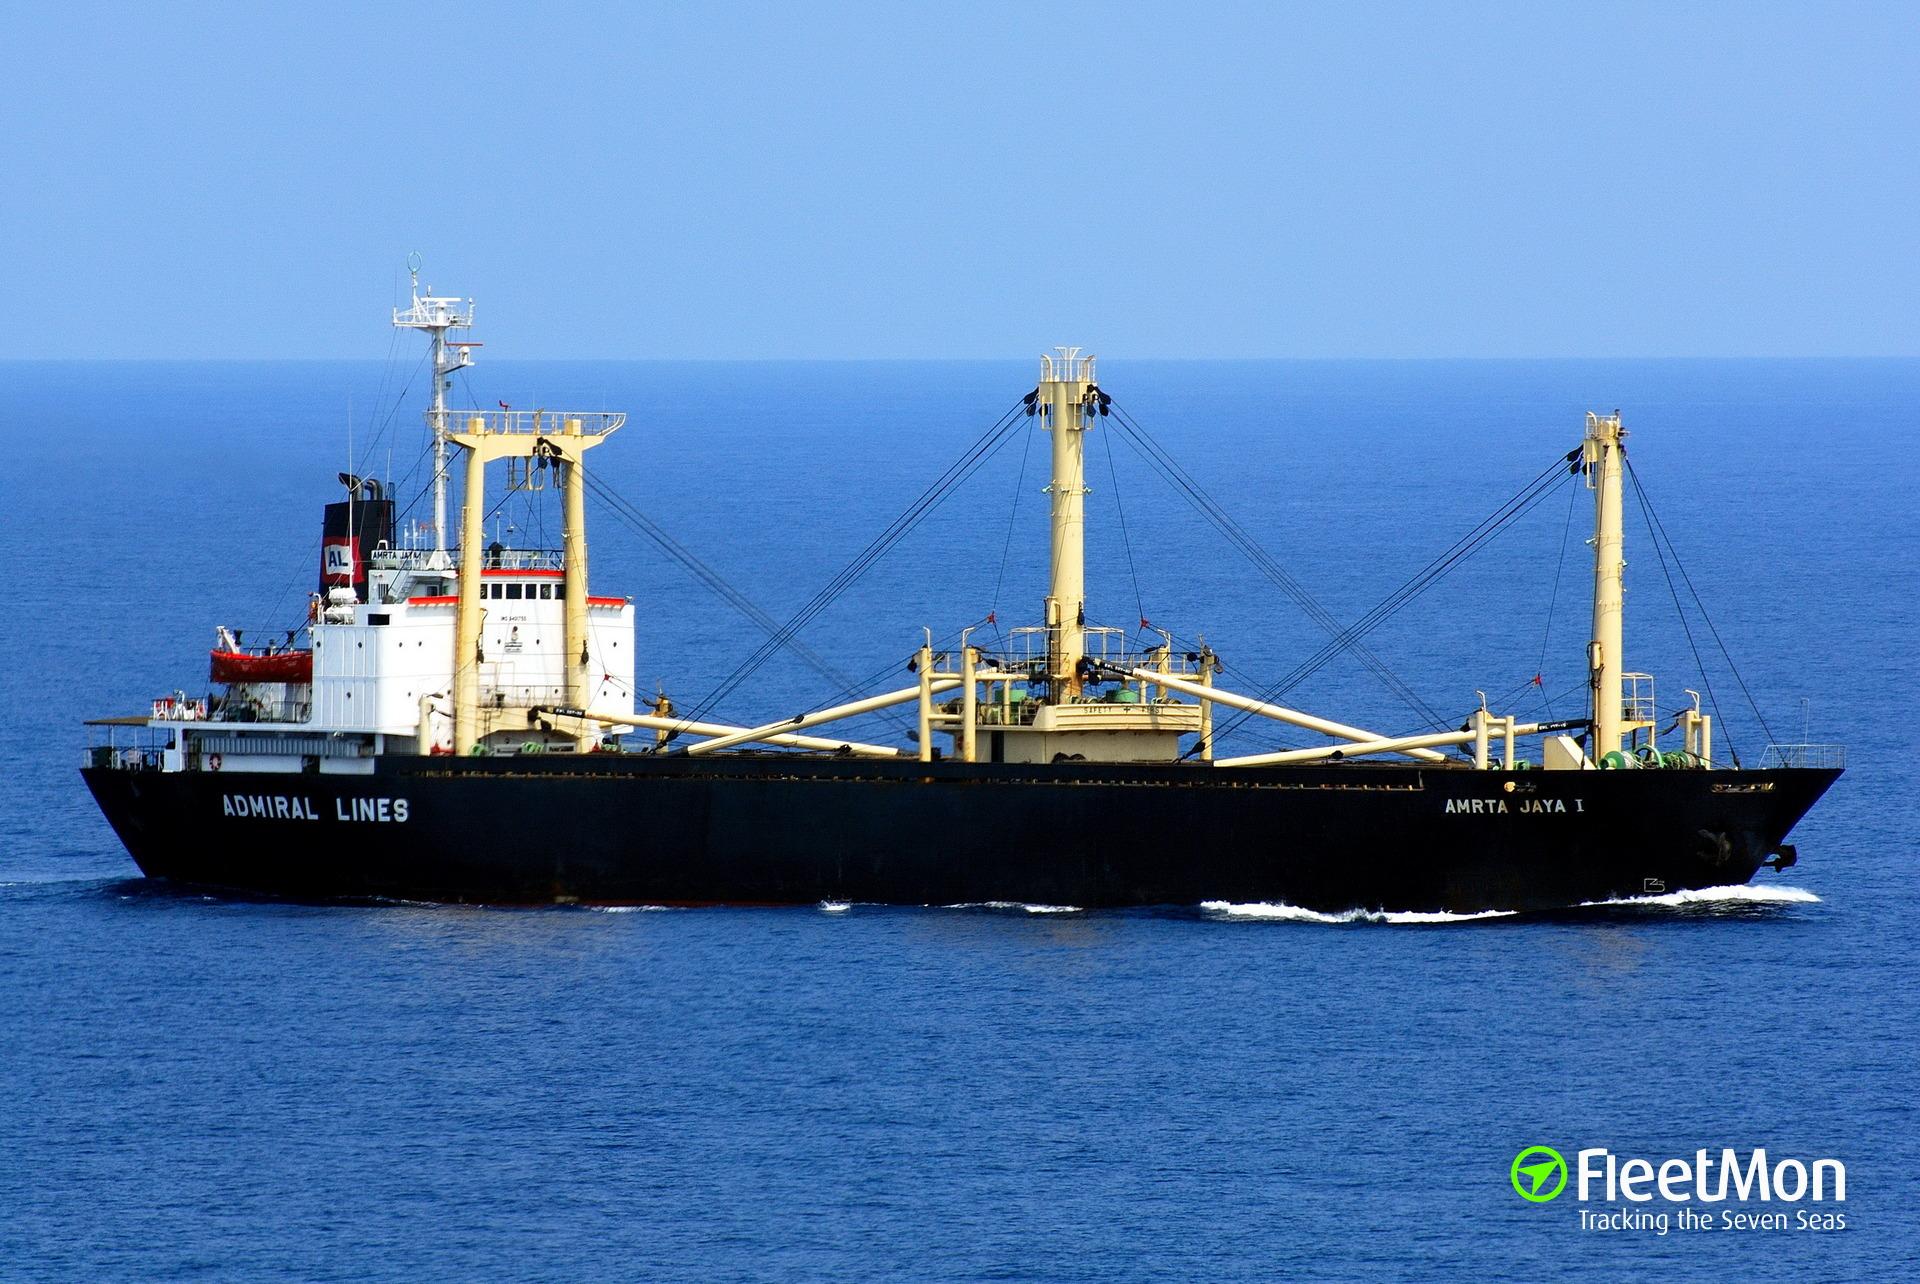 Freighter Amrta Jaya I sunk four cargo boats, Indonesia